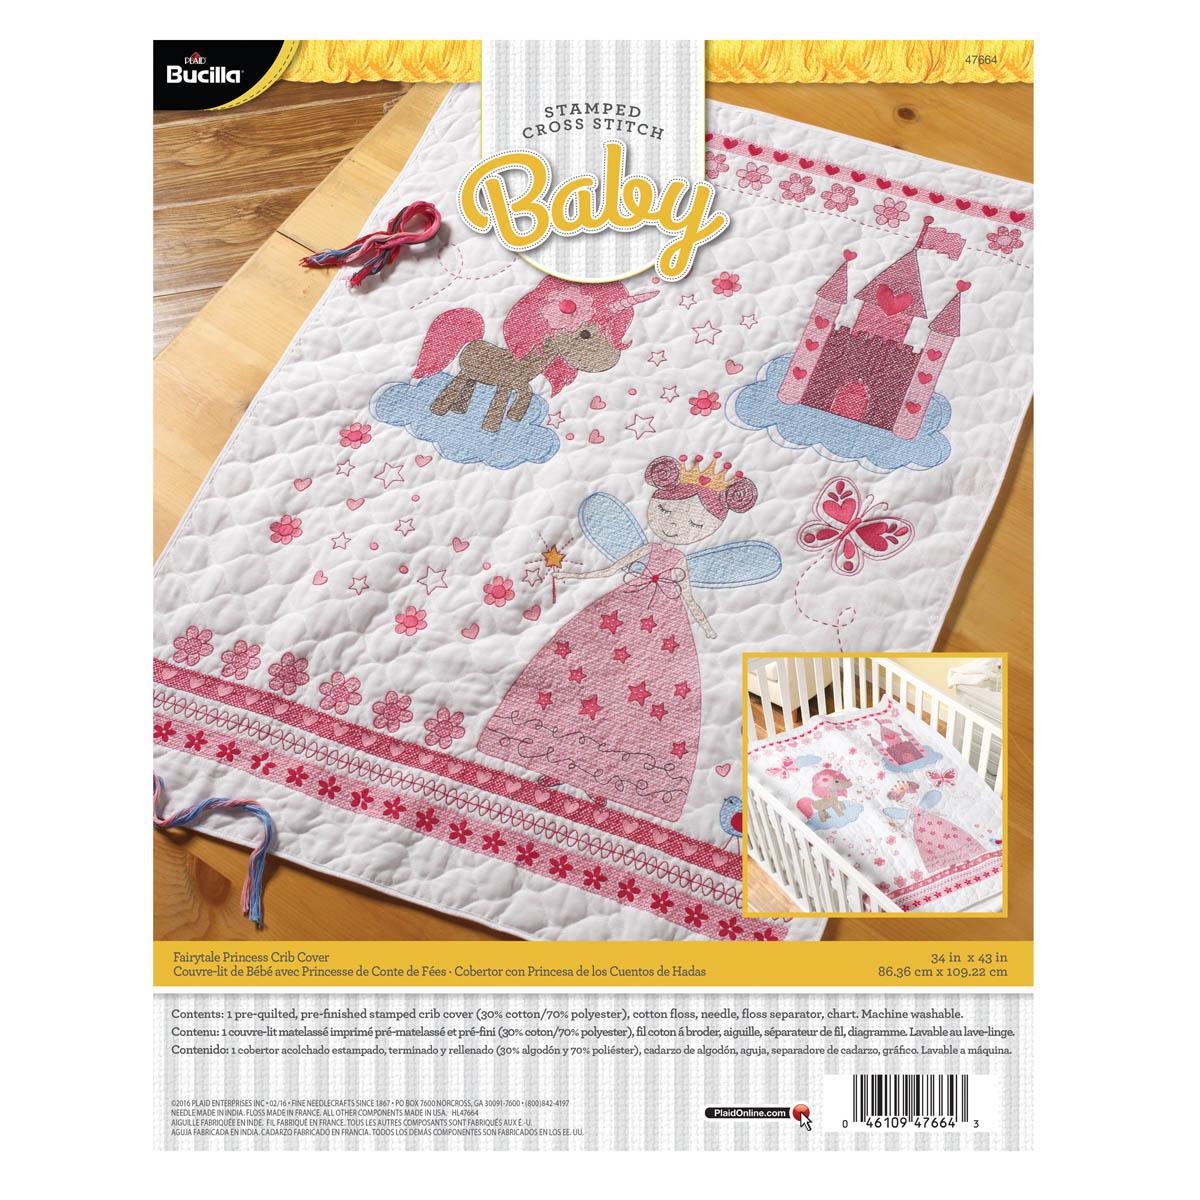 Bucilla ® Baby - Stamped Cross Stitch - Crib Ensembles - Fairytale Princess - Crib Cover